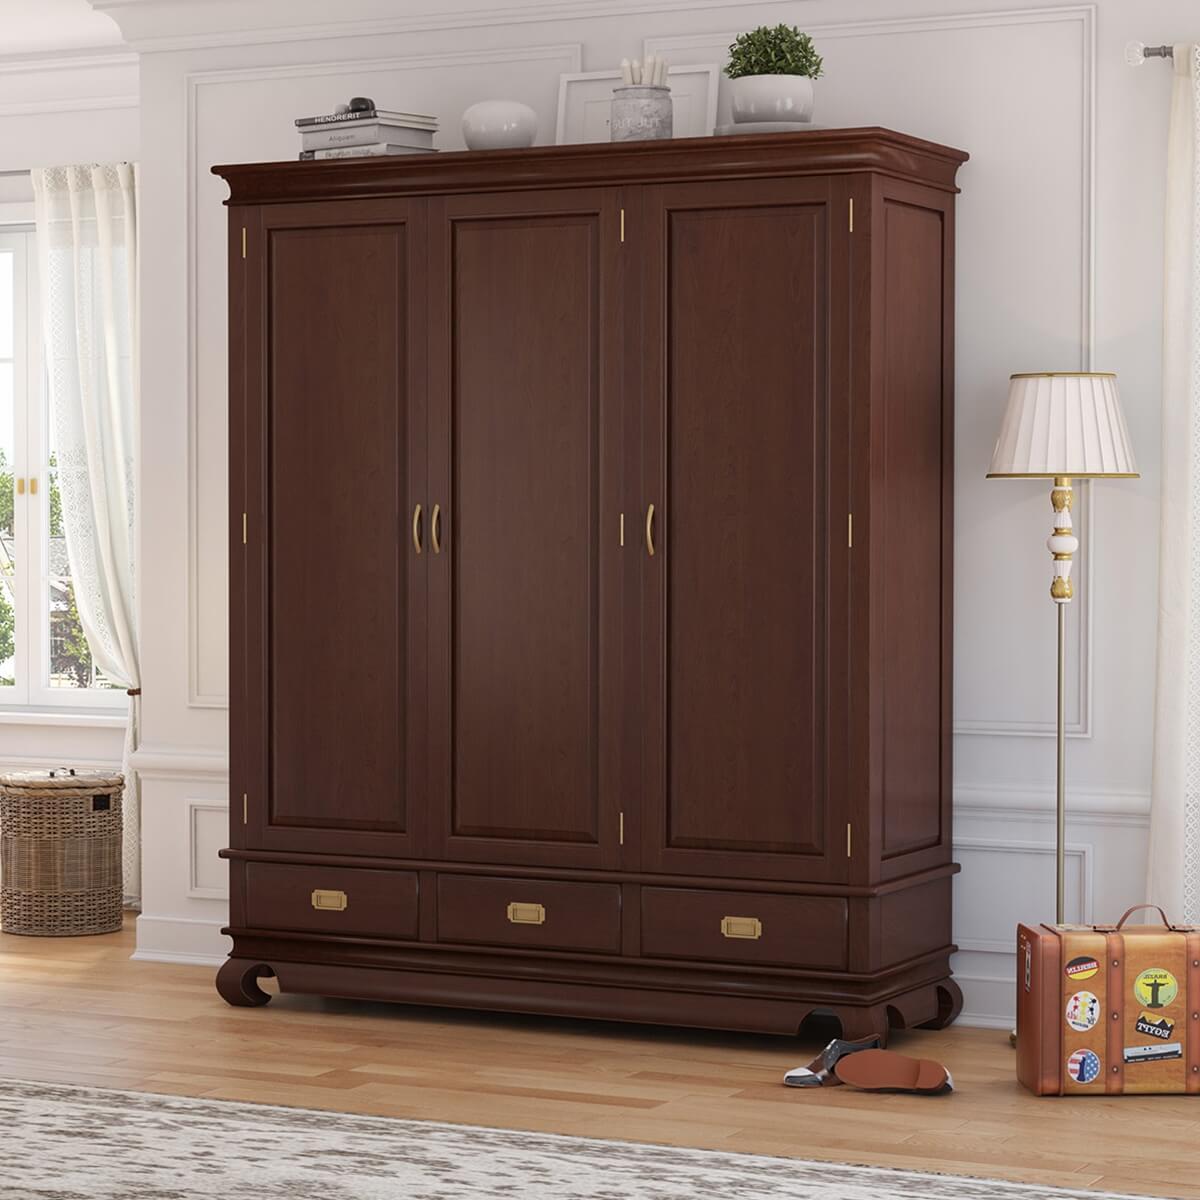 Oraibi 3 Door Mahogany Wood Large Armoire Wardrobe With Drawers